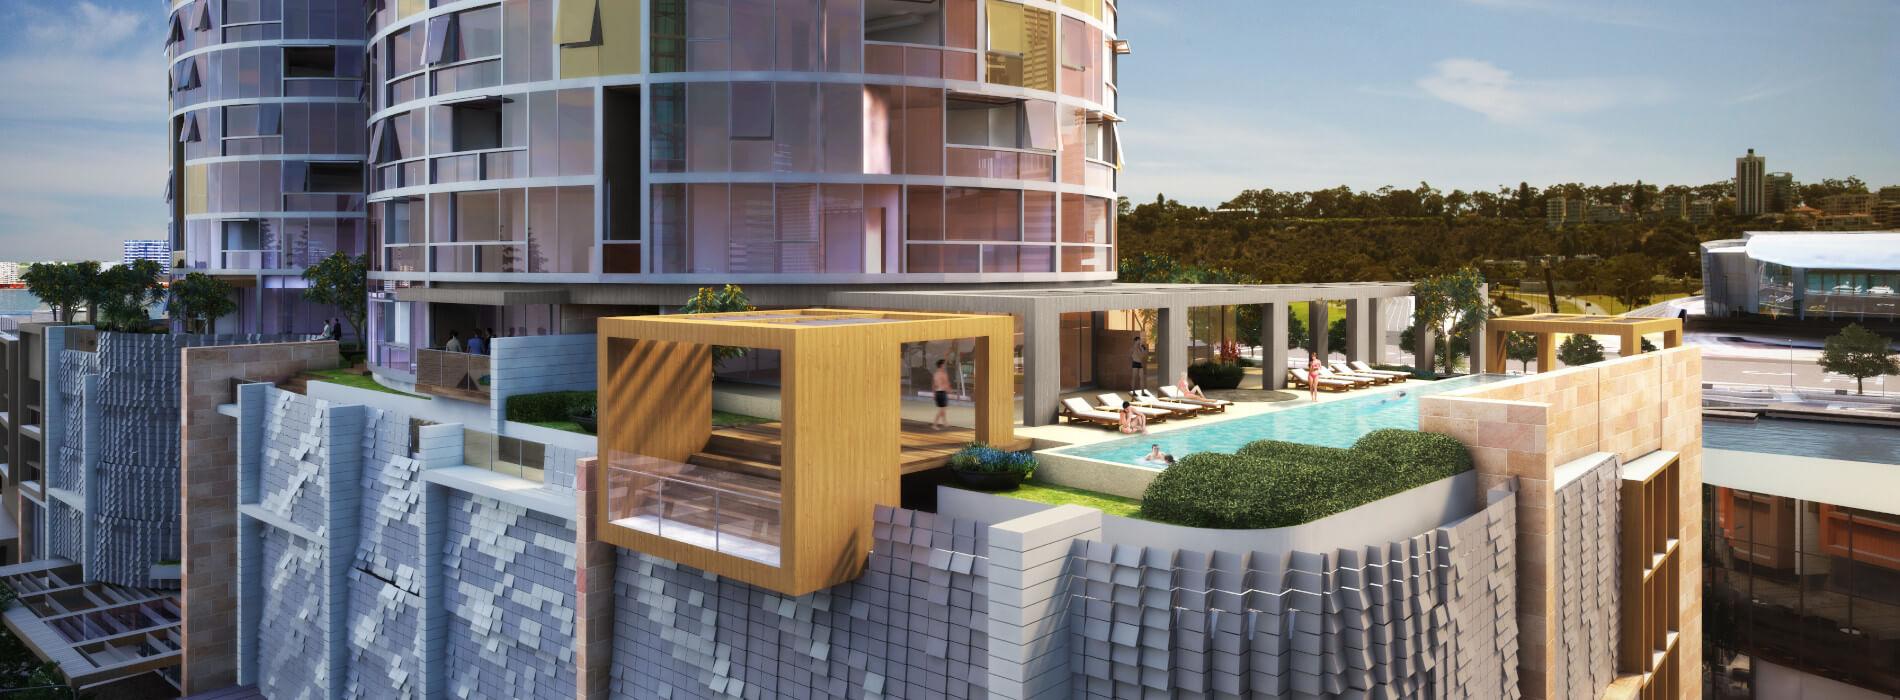 WA Building Development